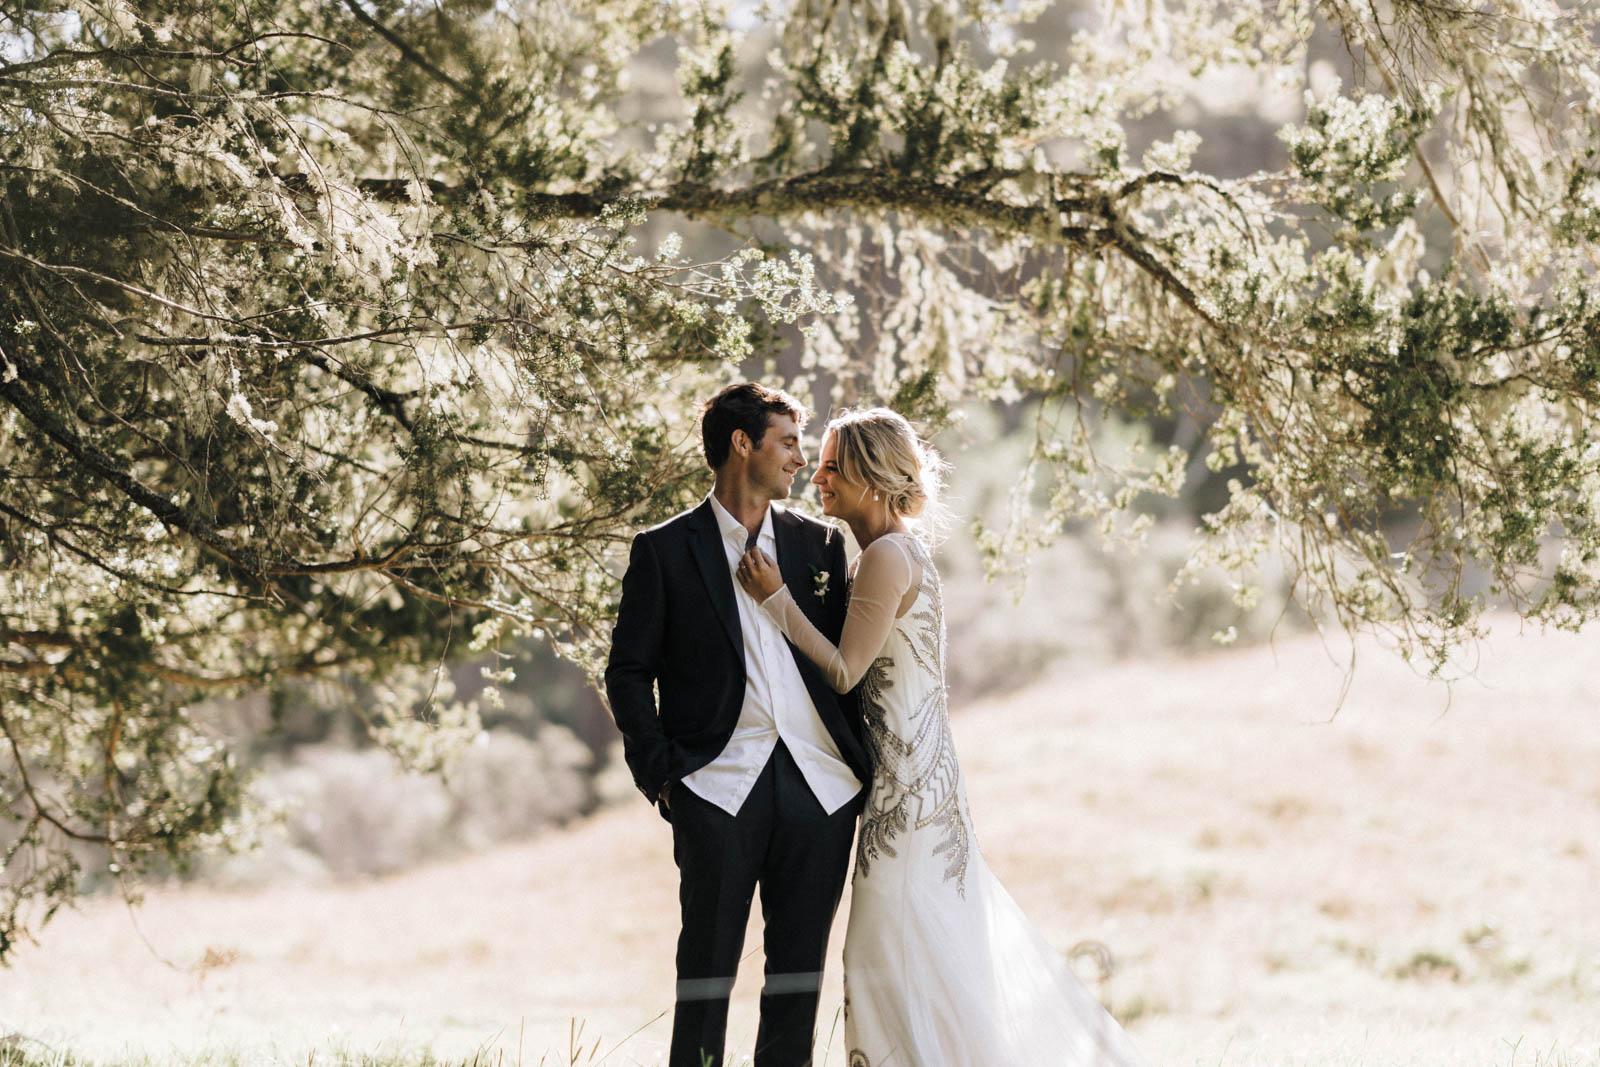 newfound-l-i-coromandel-wedding-photographer-1730-A9_03690